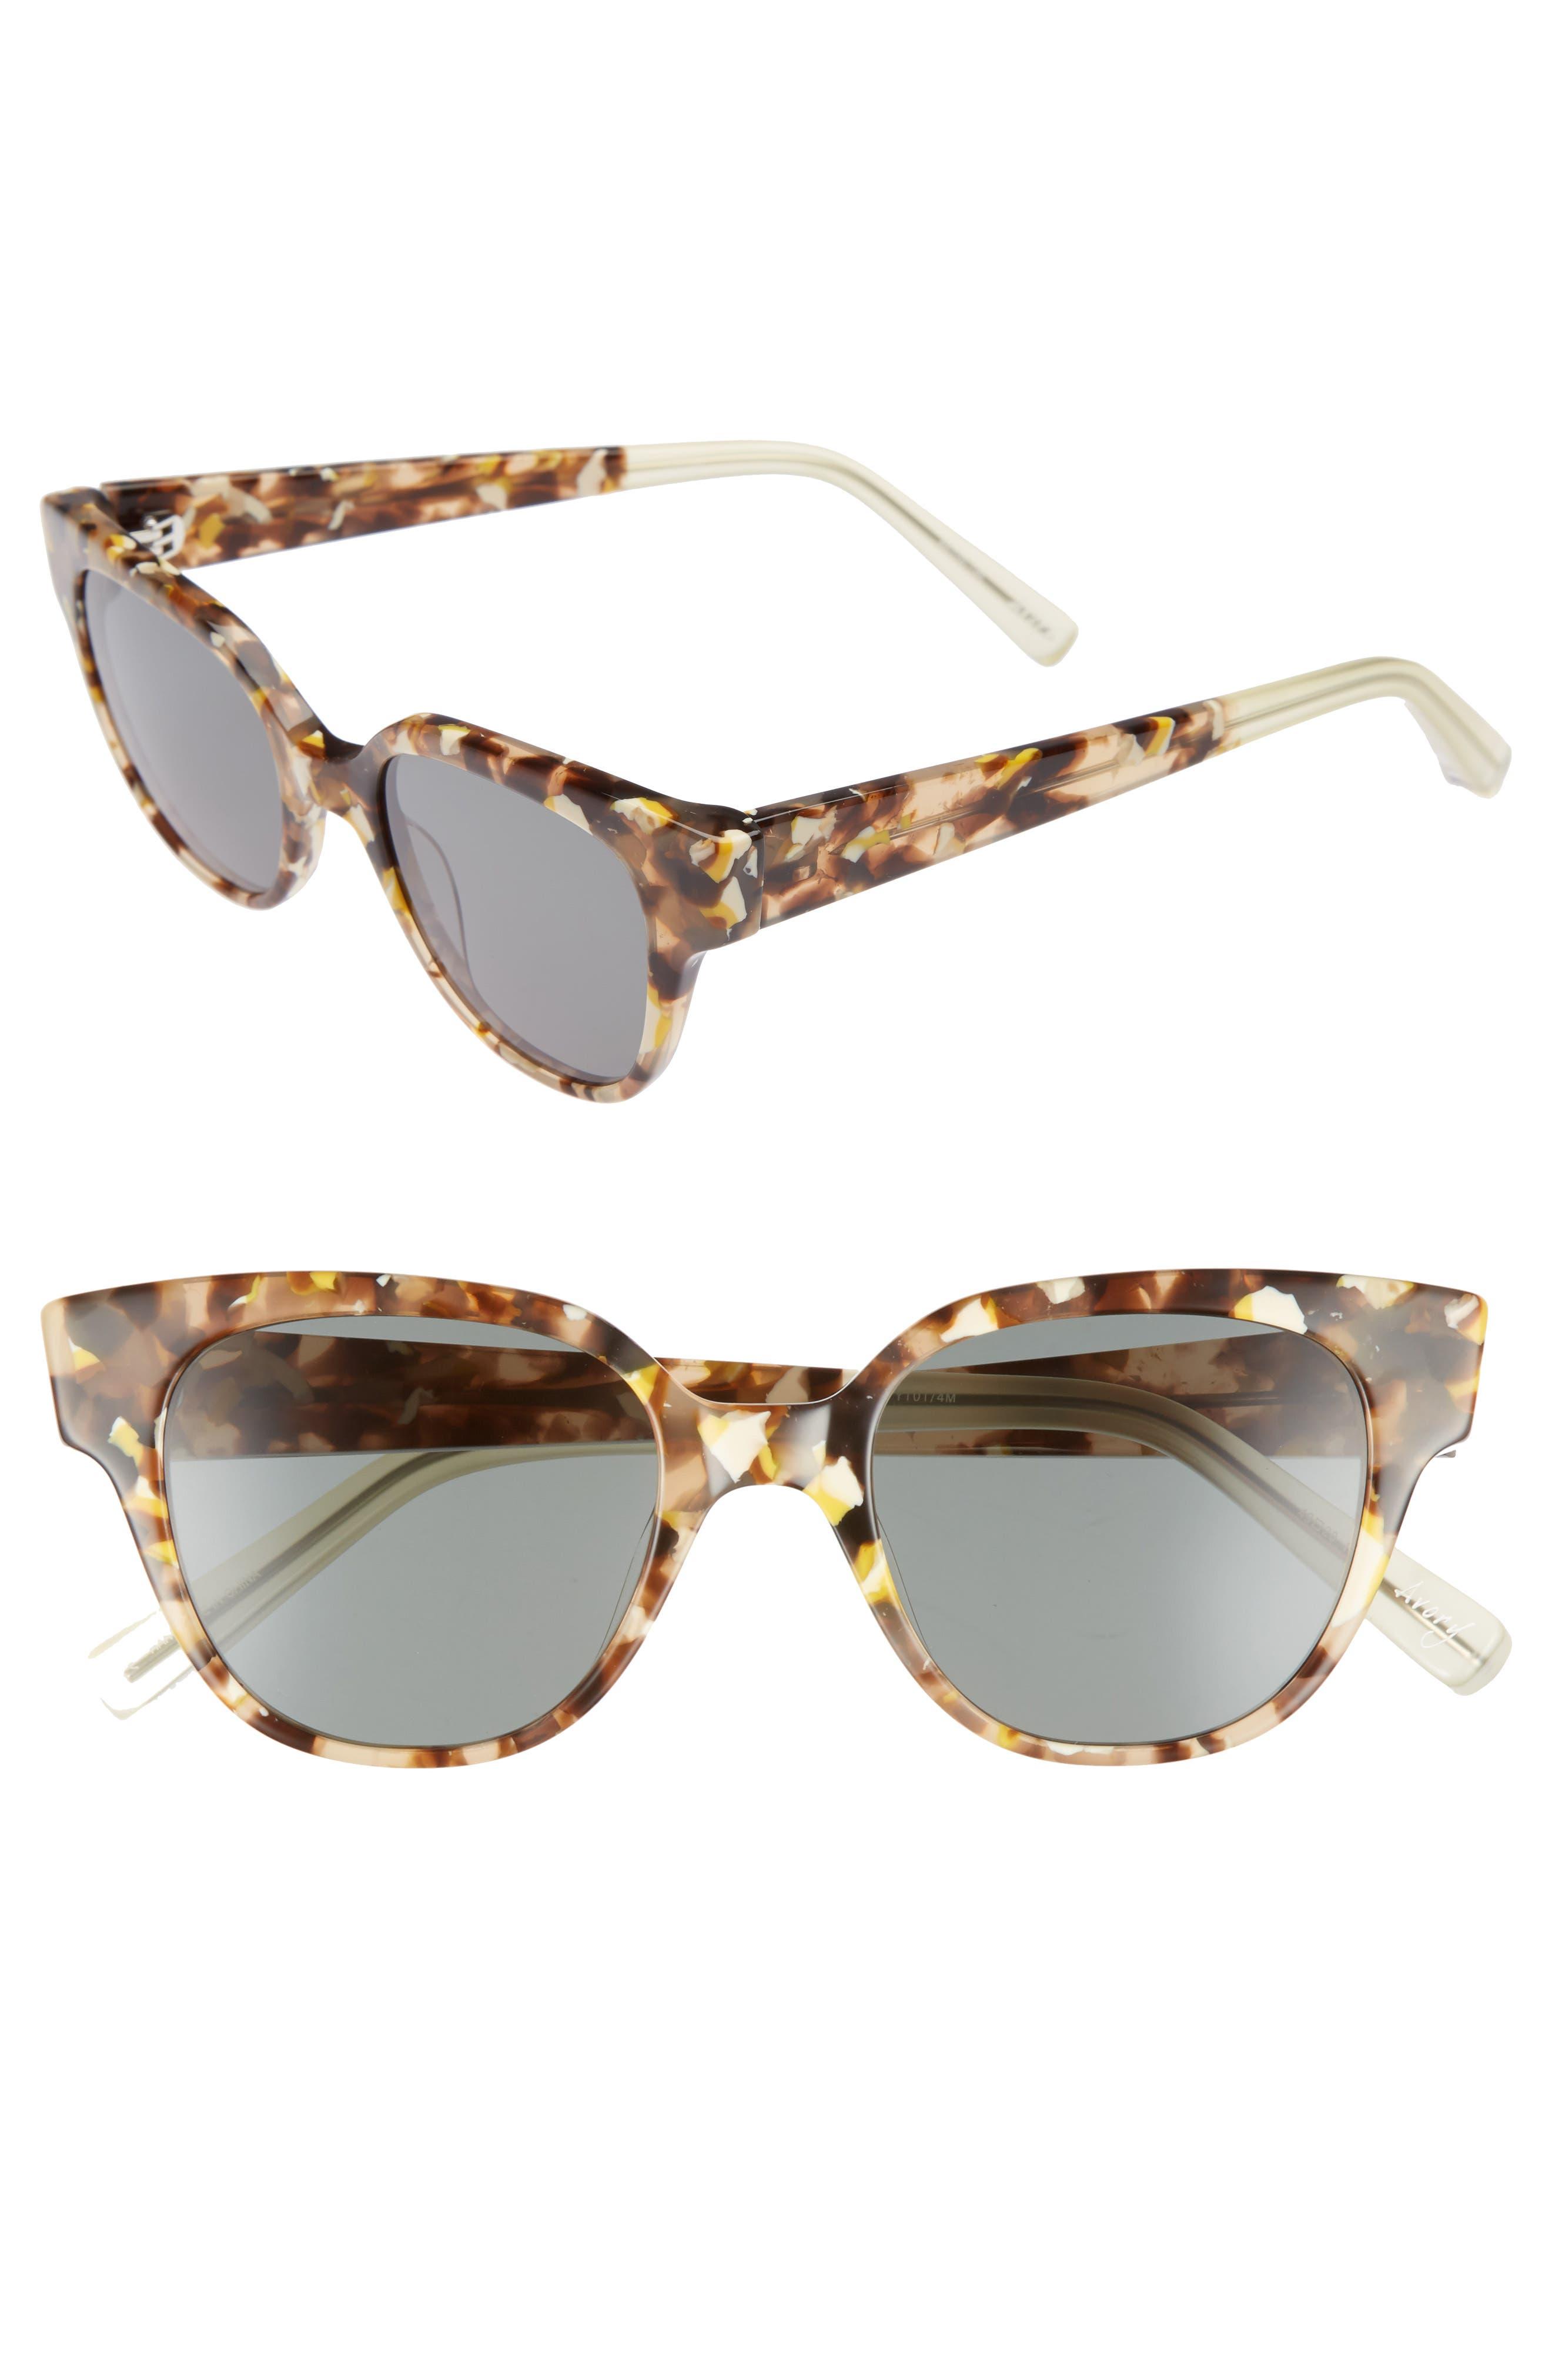 Avory 49mm Cat Eye Sunglasses,                             Main thumbnail 1, color,                             Amber/ Green